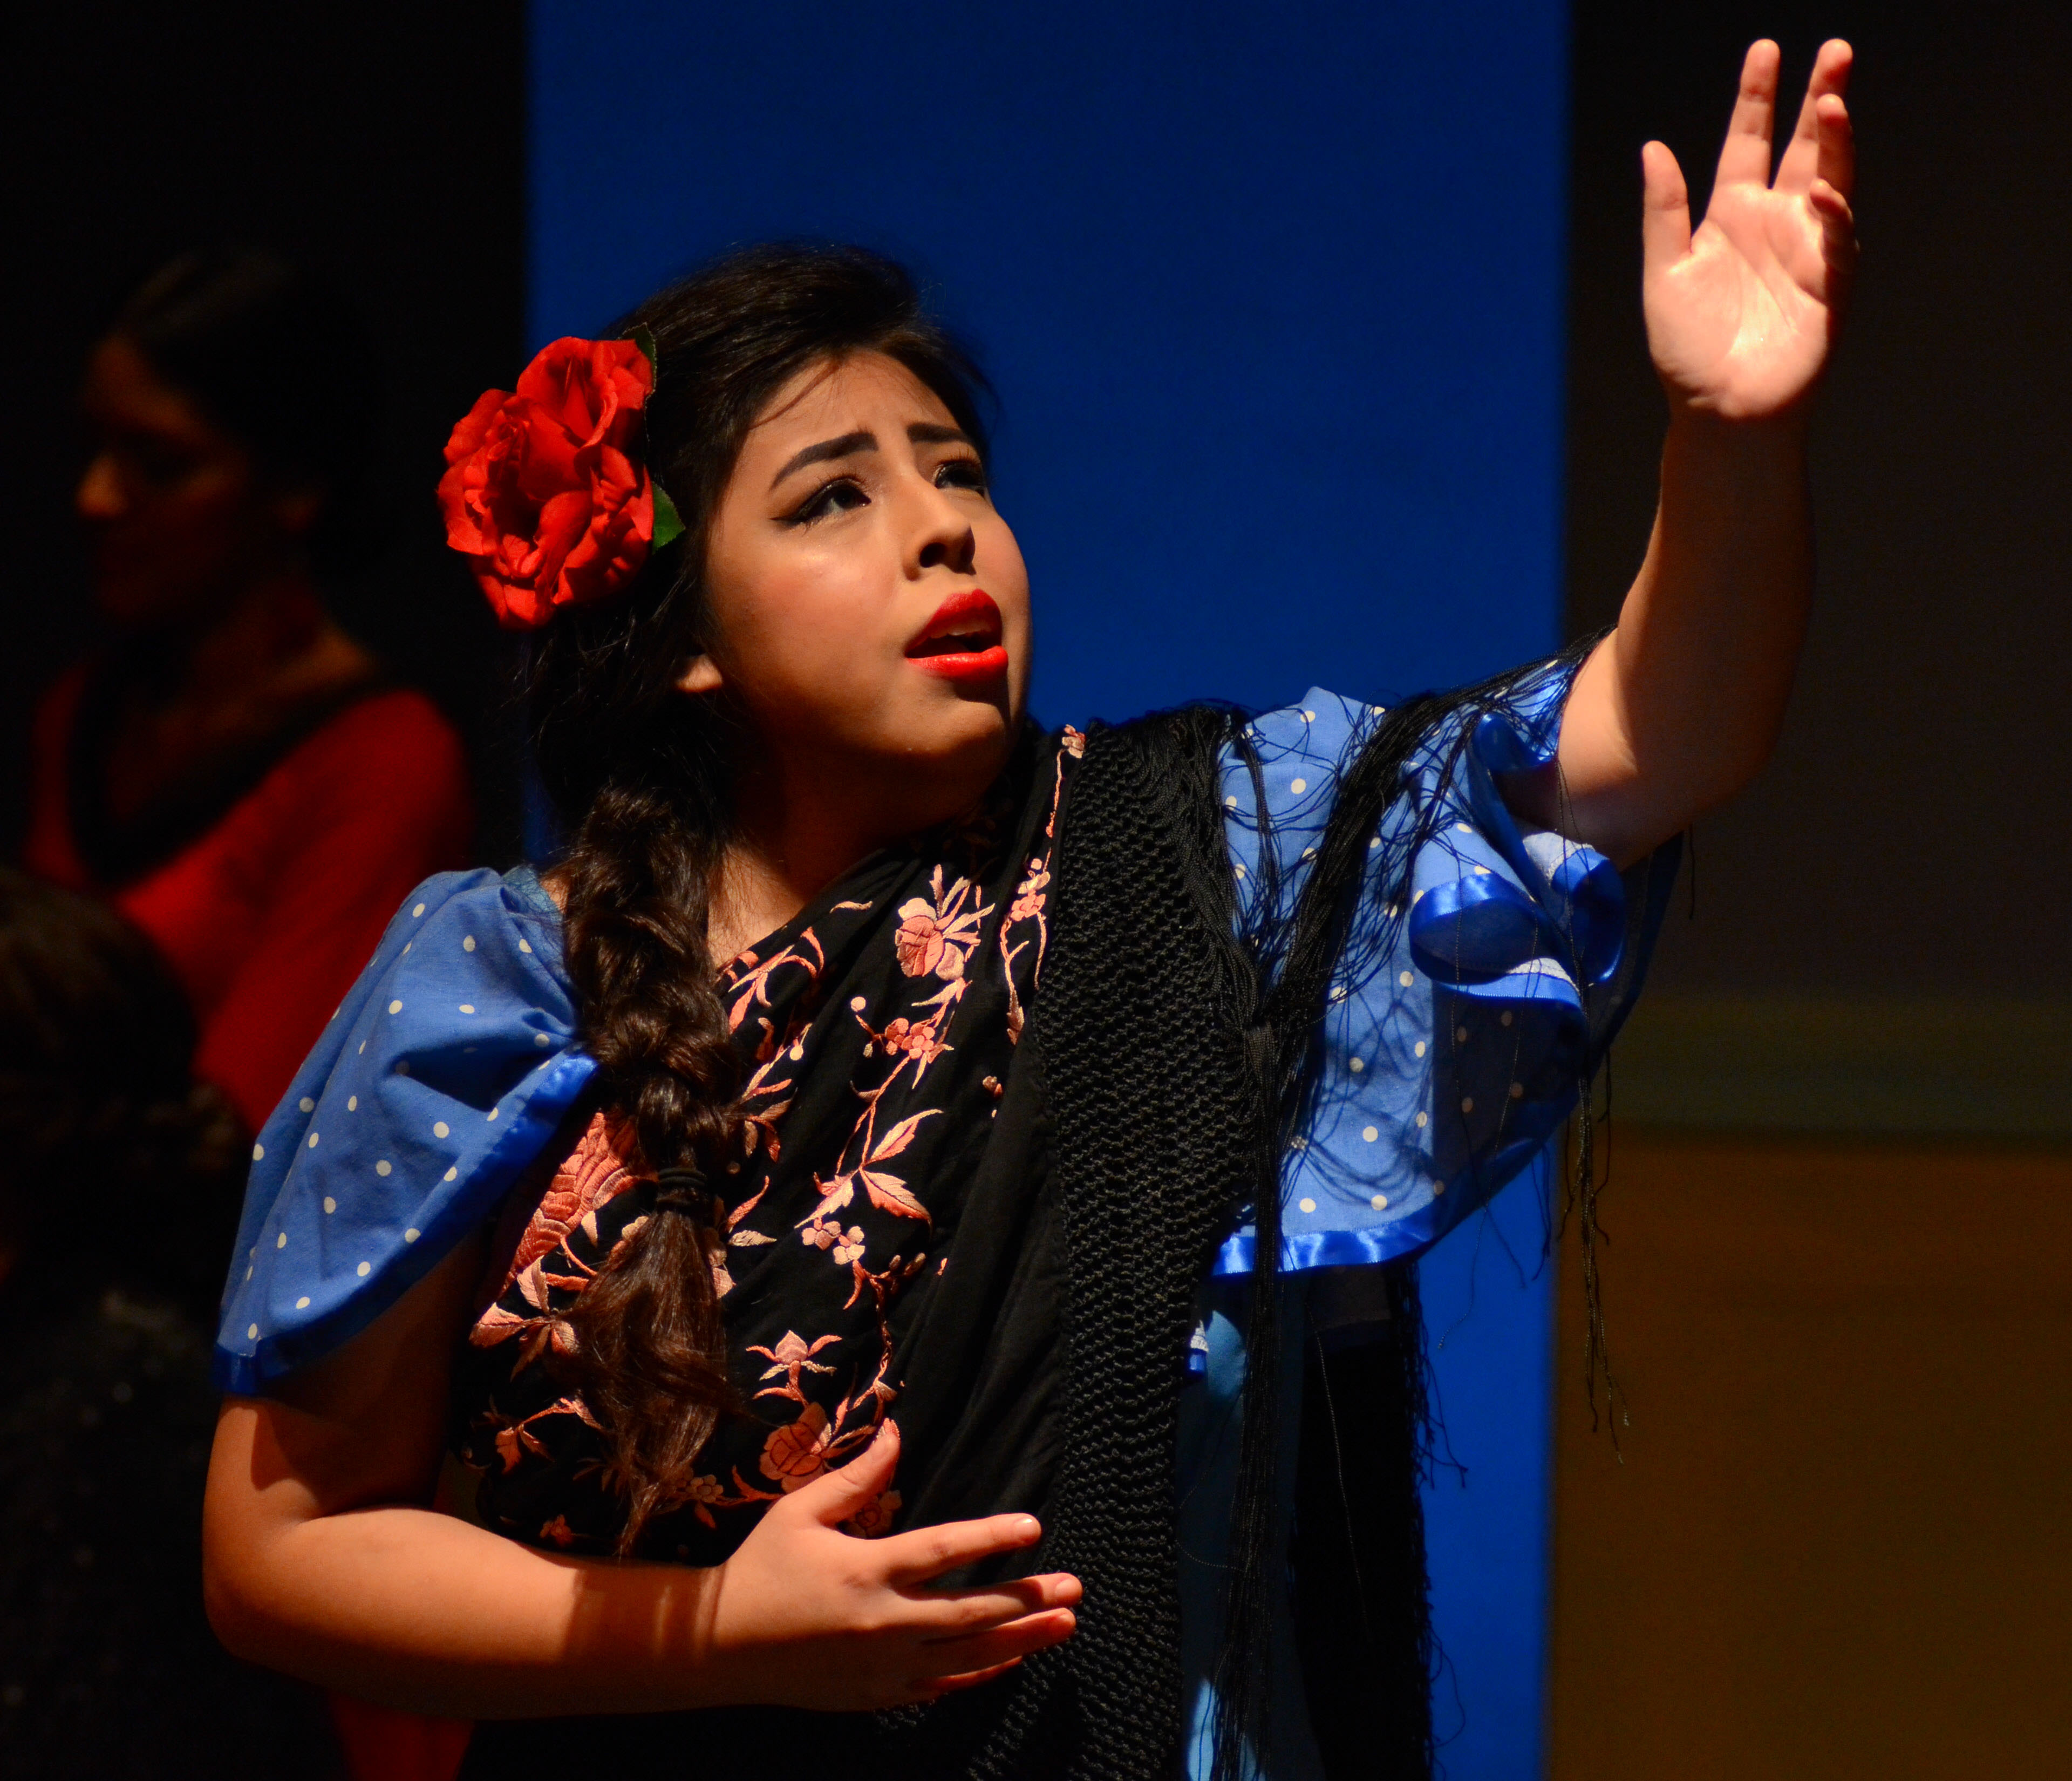 Salud (Shaina Martinez). Photo by Paul Wegner.